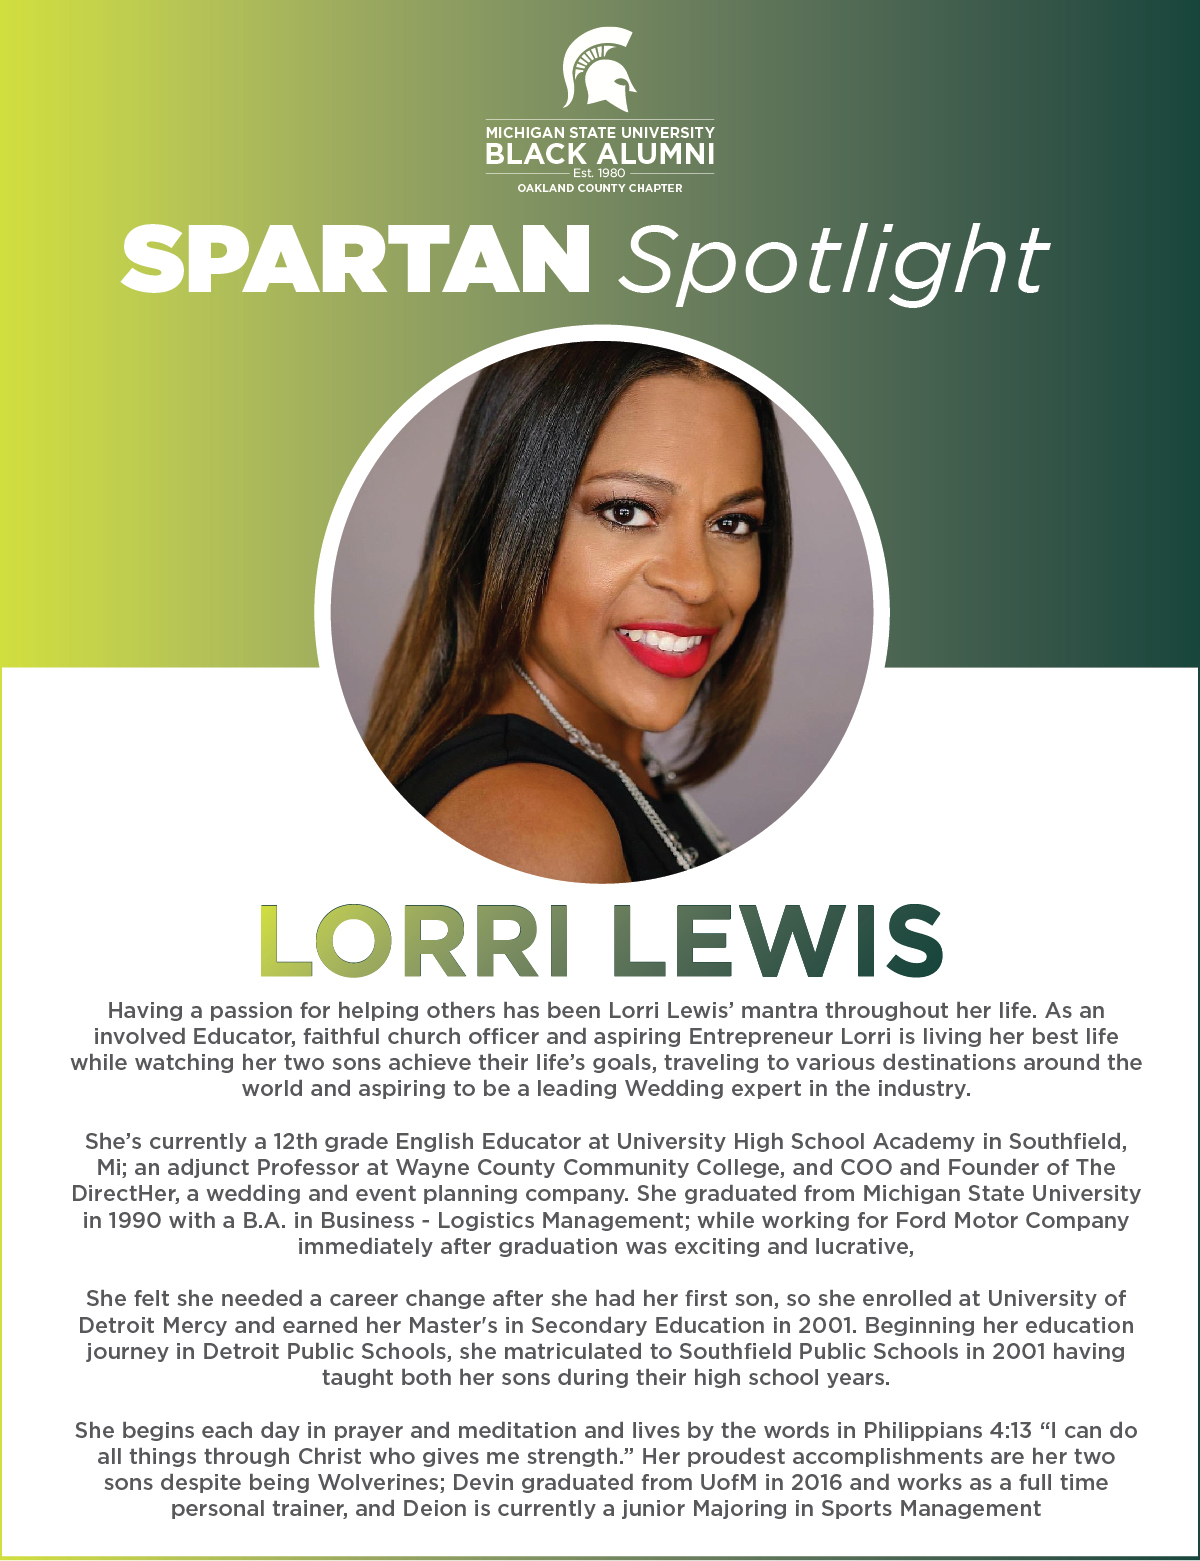 MSUBAOC Spartan Spotlight Lorri Lewis (I